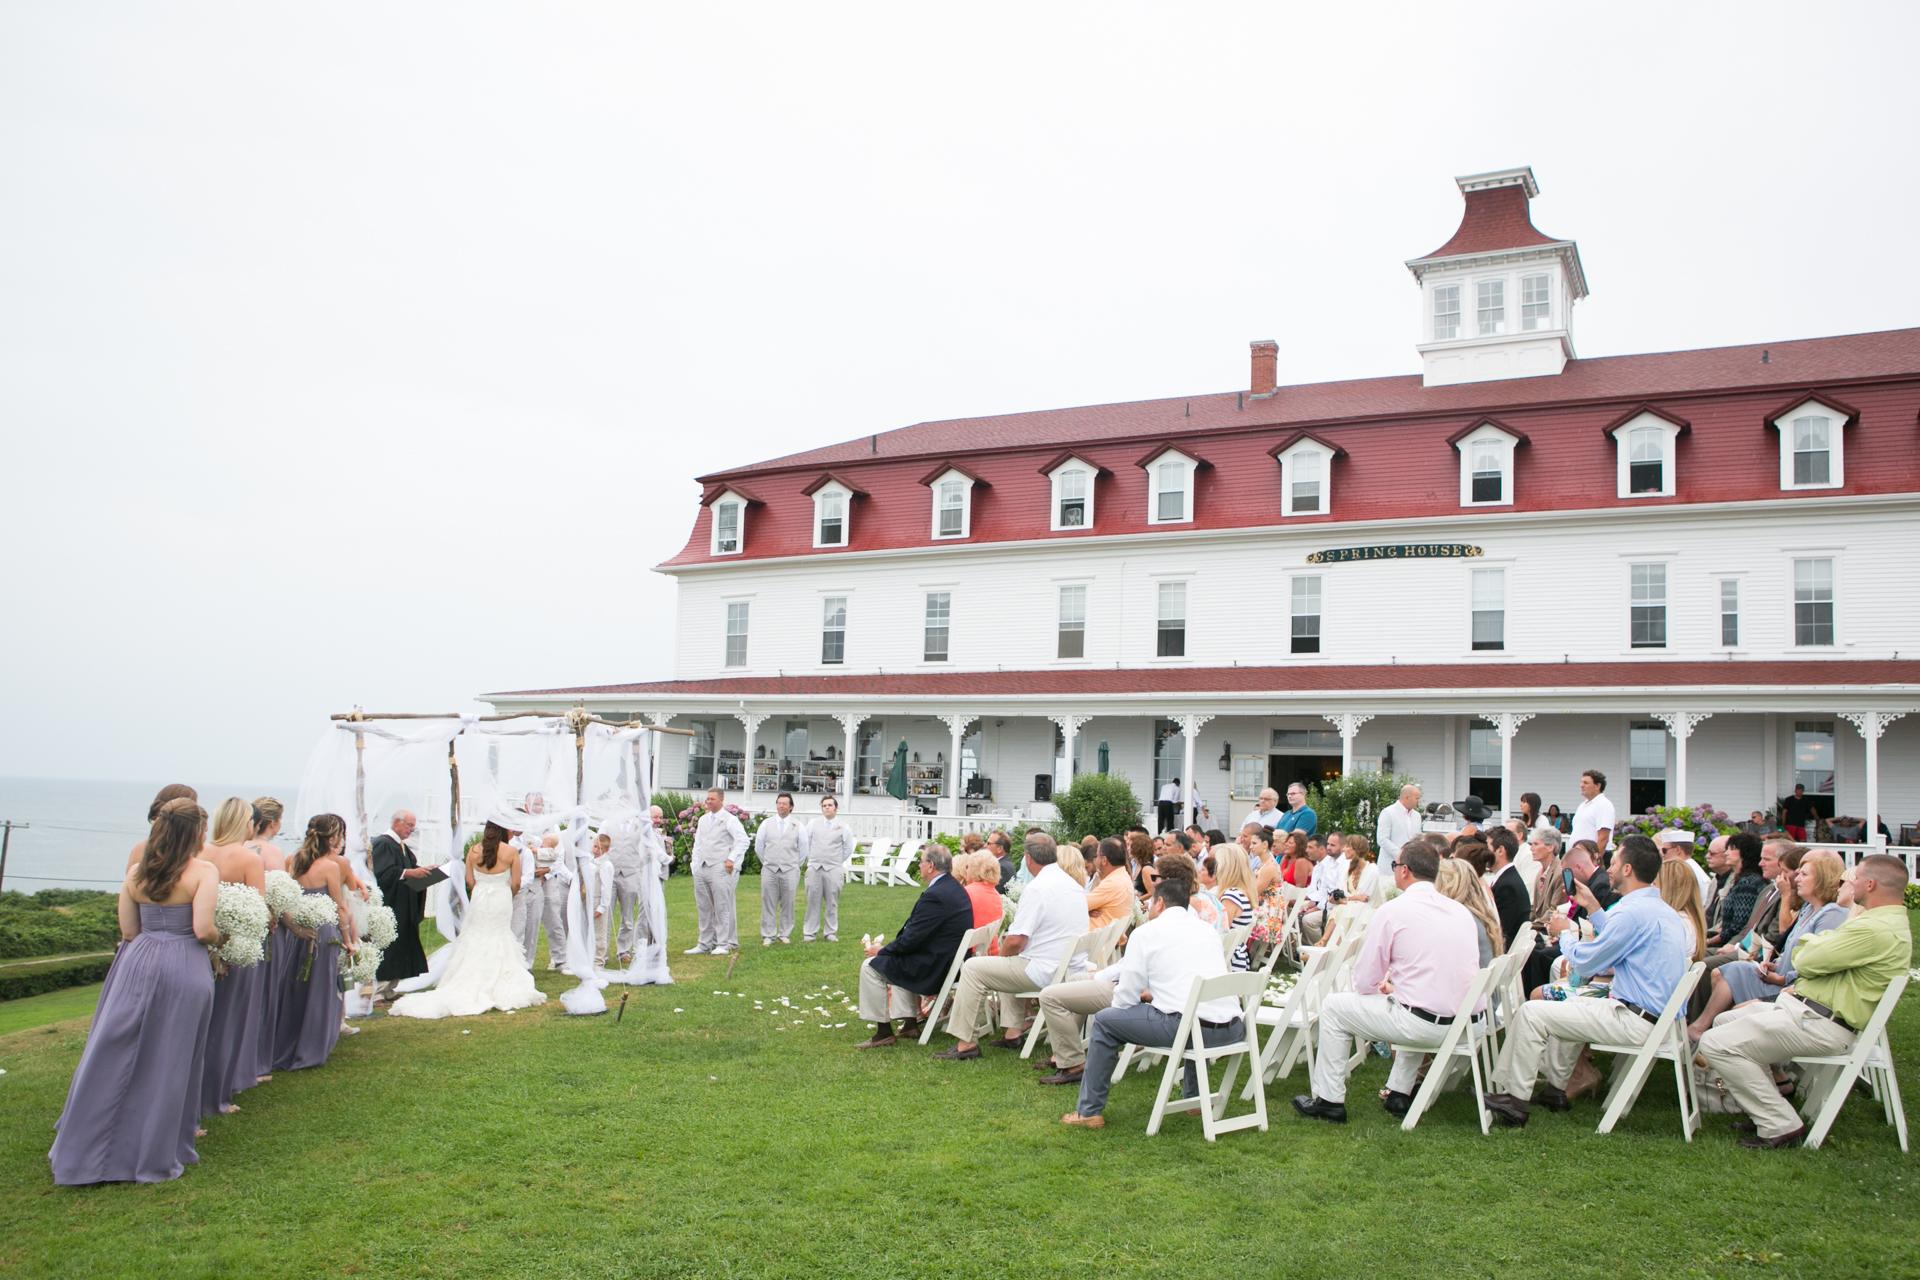 A wedding ceremony near the ocean in New York, showcasing the venue